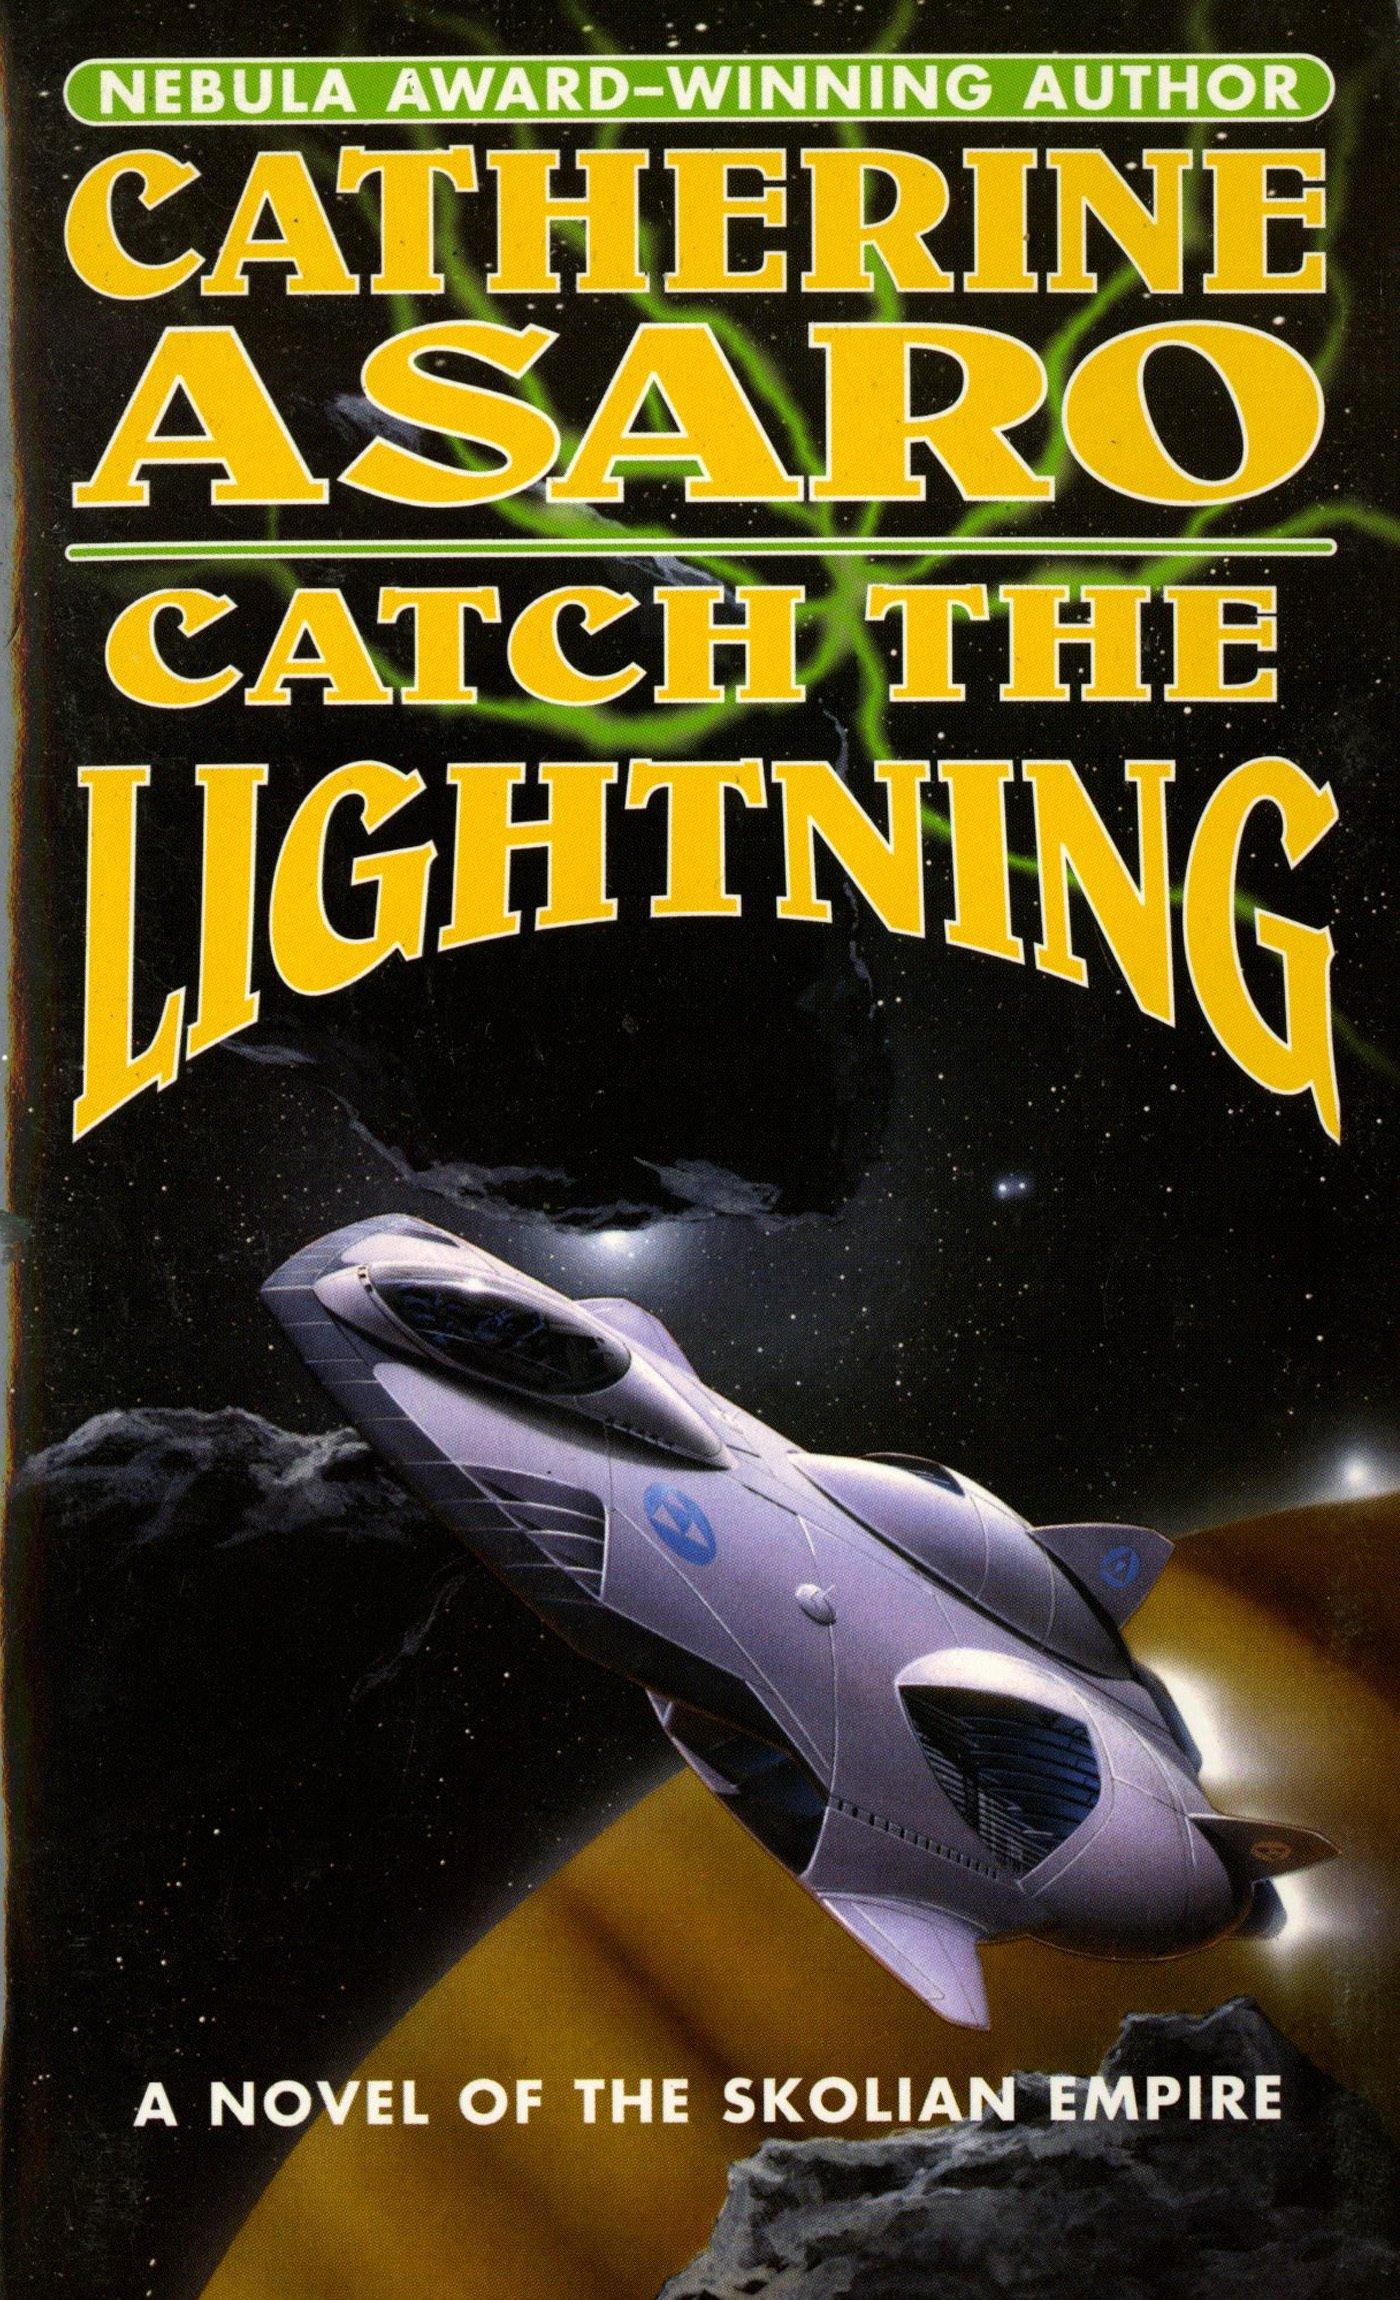 Catch The Lightning (The Saga of the Skolian Empire) ebook